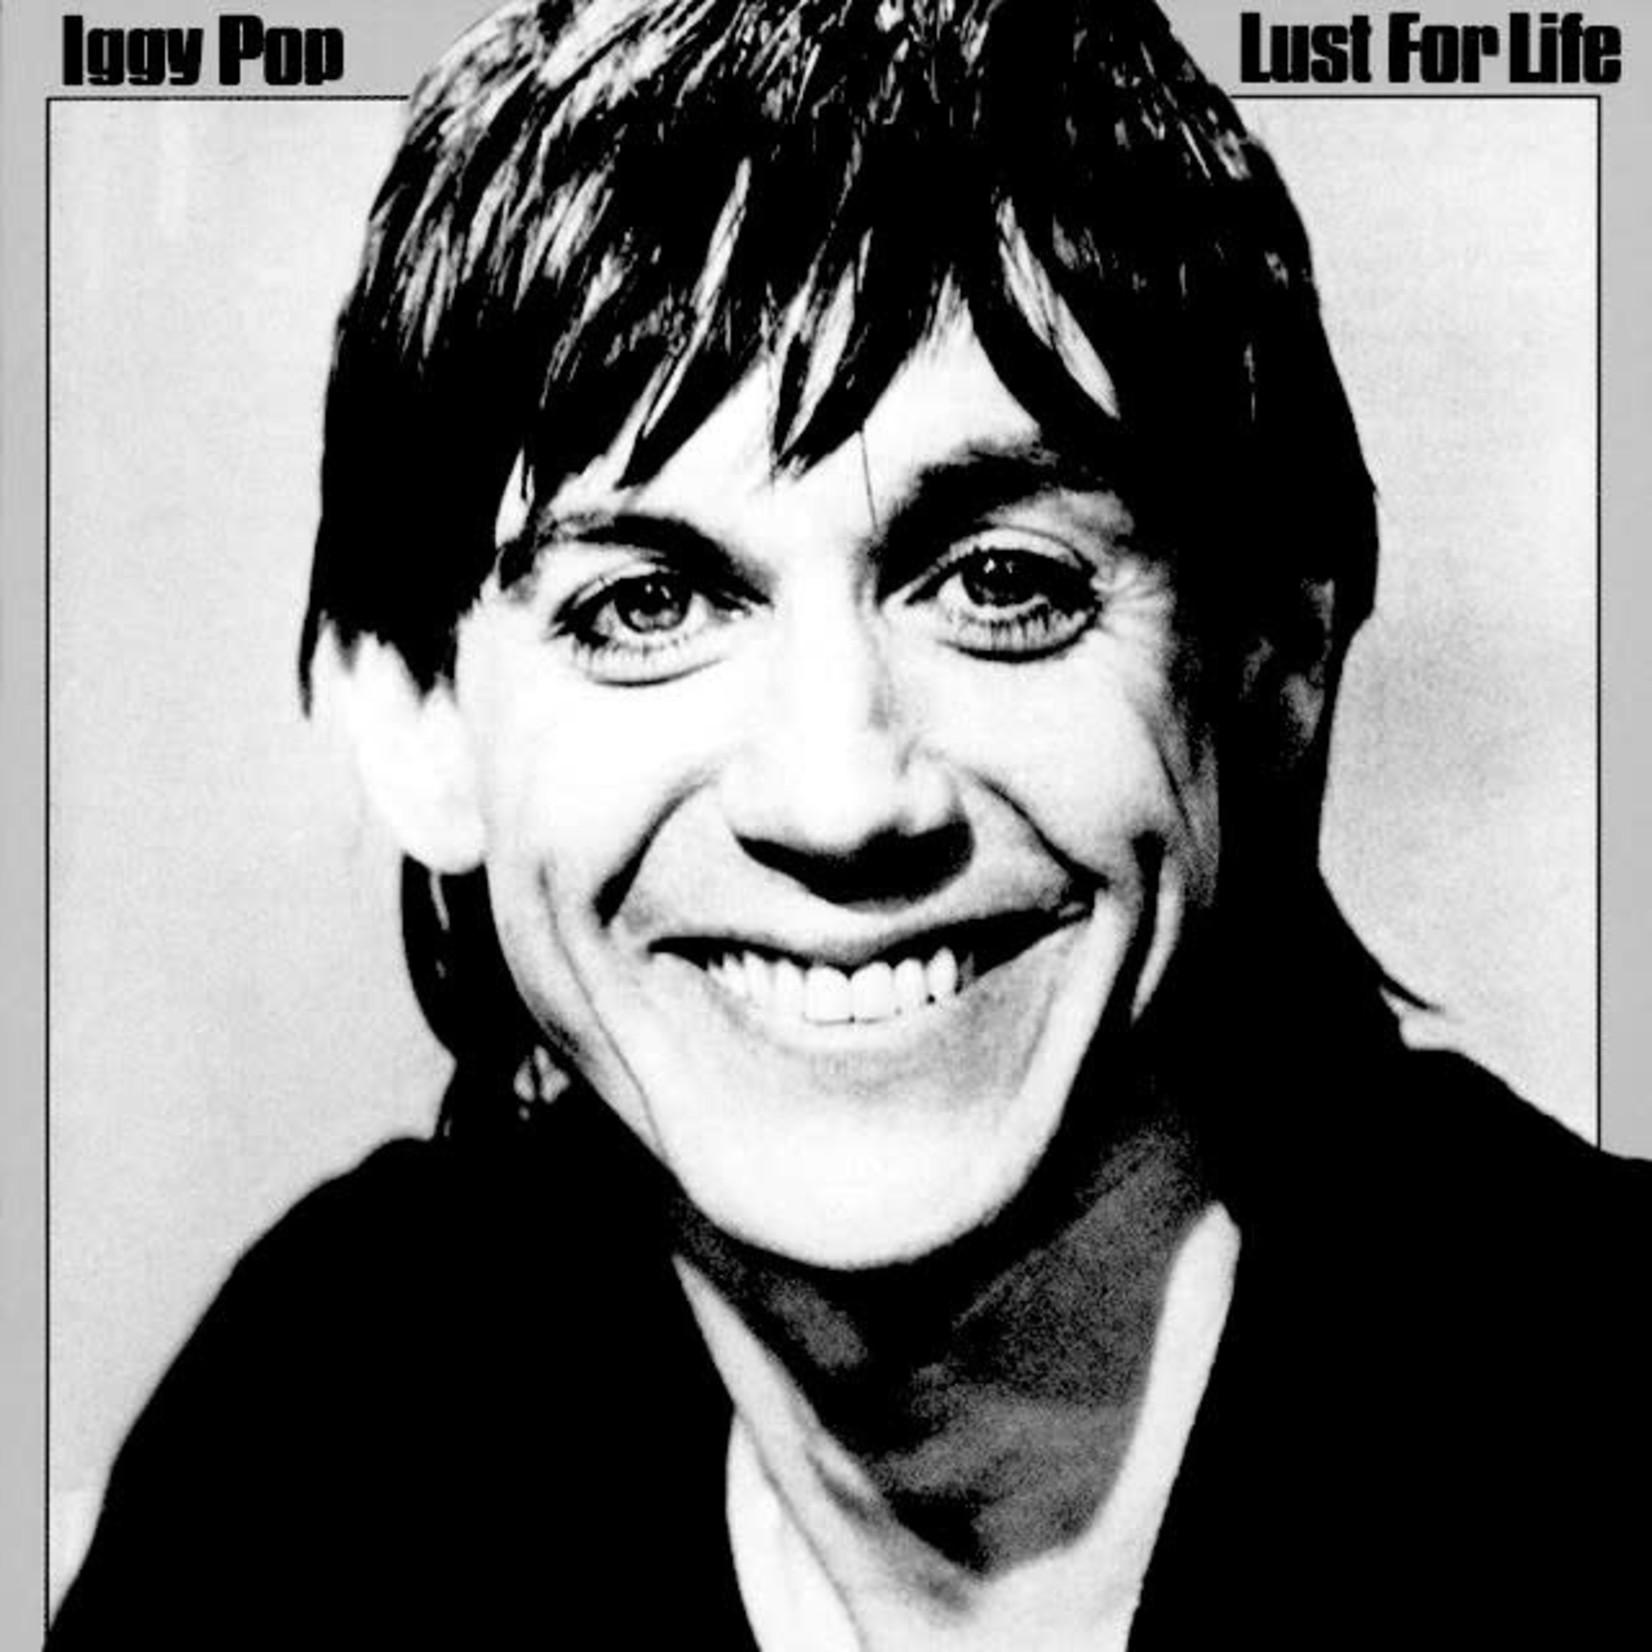 Vinyl Iggy Pop - Lust For Life